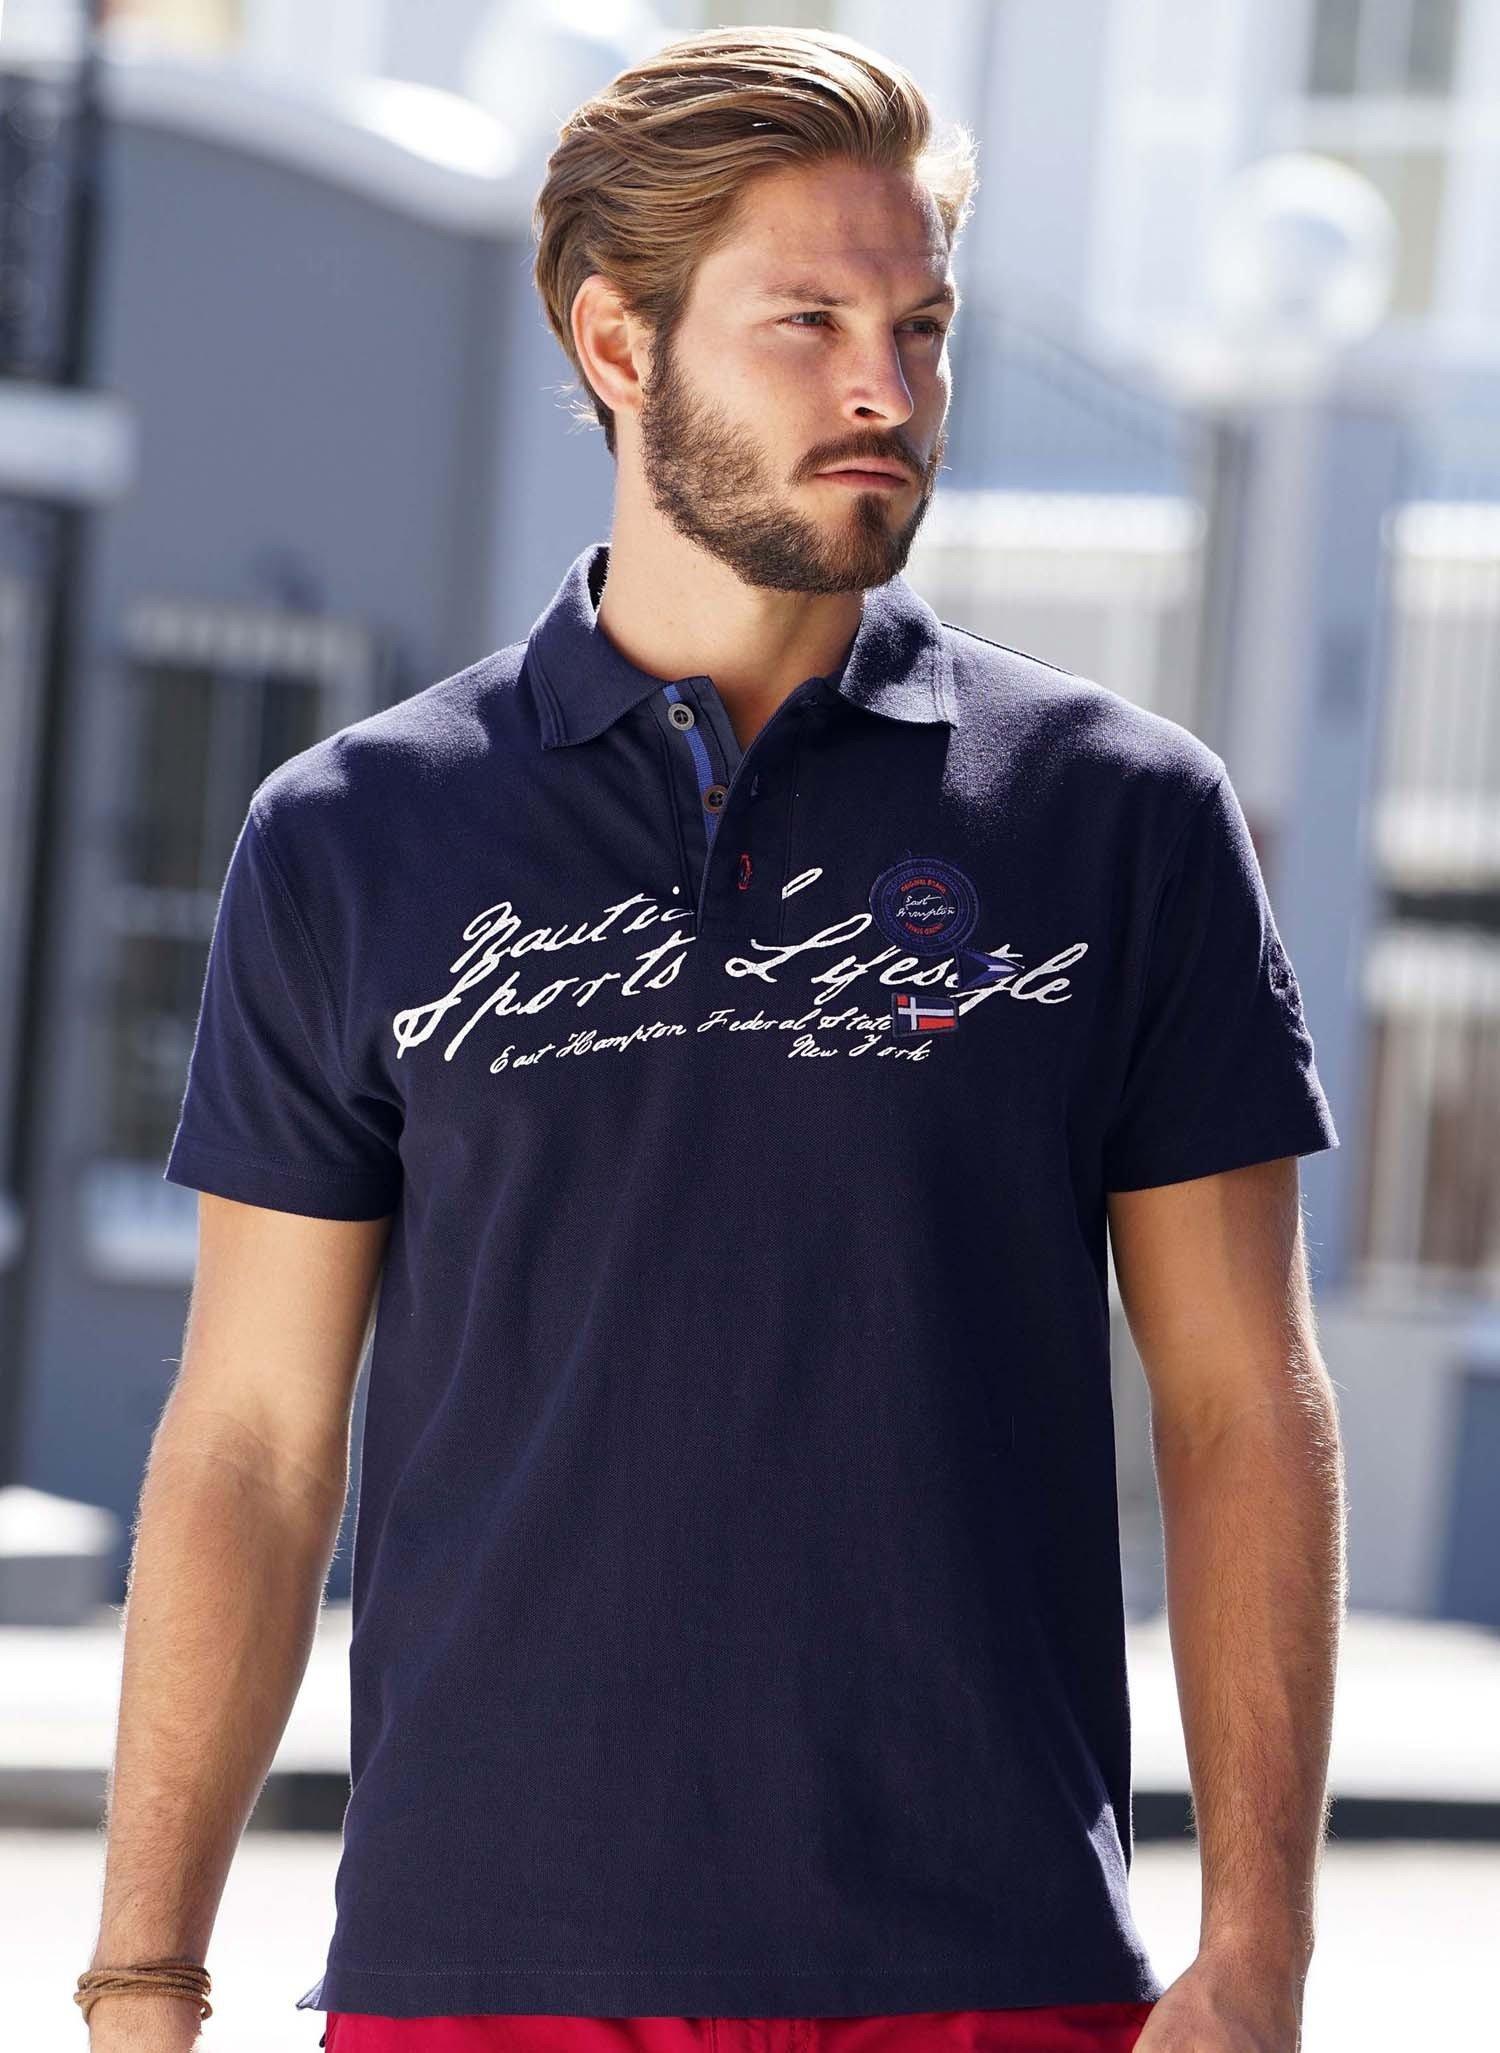 H-KA-Polo-Shirt,Label marine M 053 - 1 - Ronja.ch